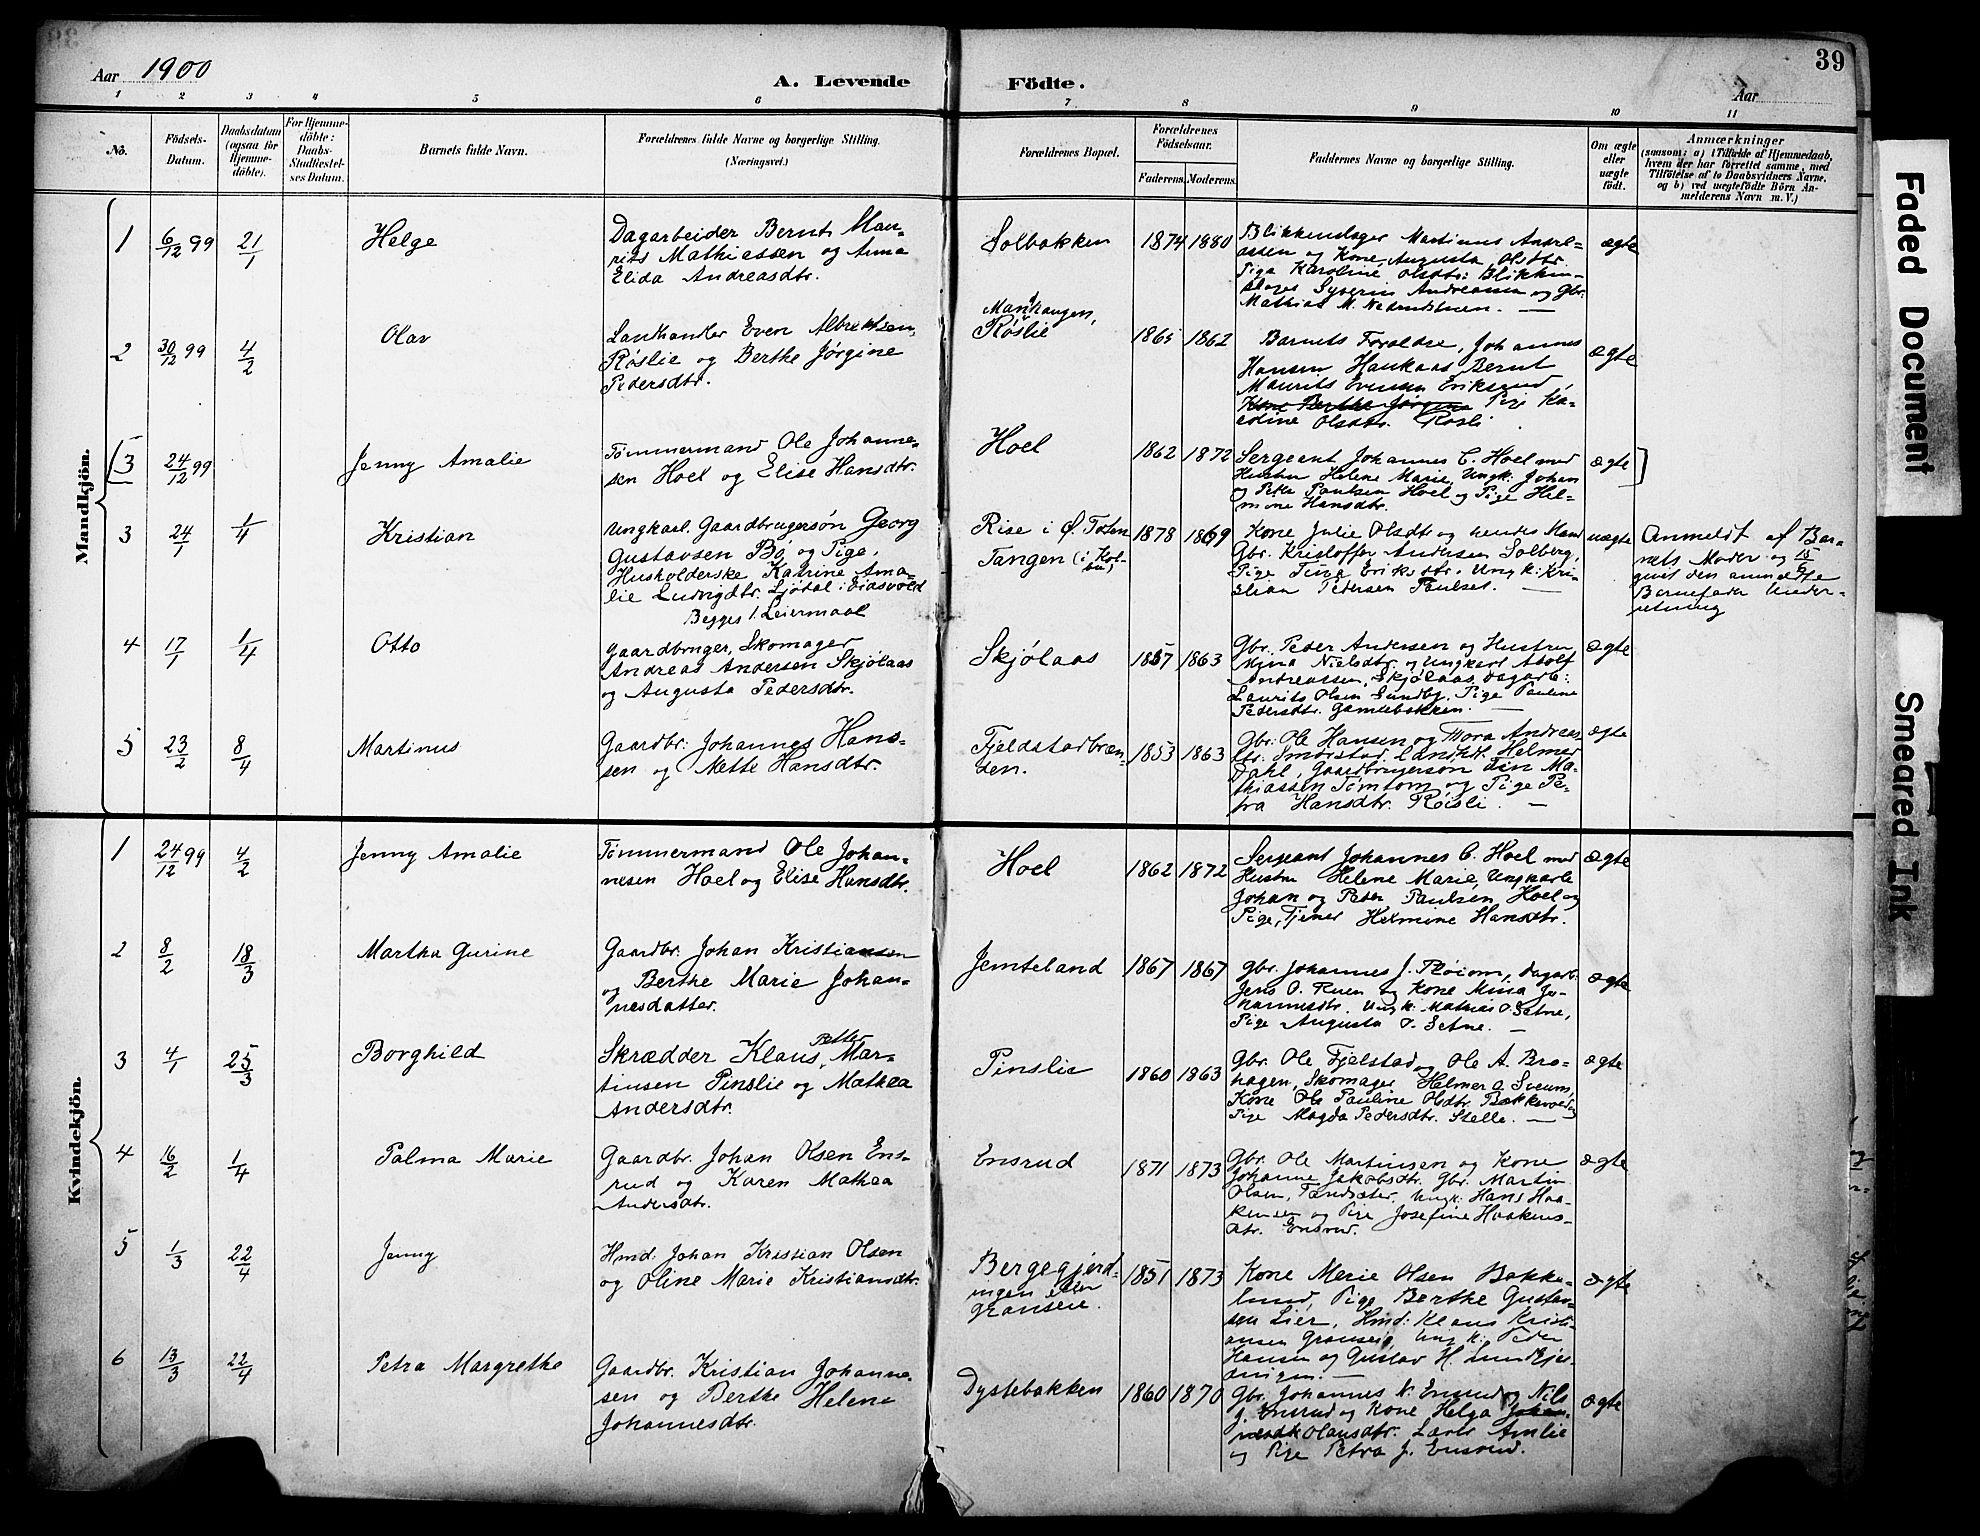 SAH, Vestre Toten prestekontor, H/Ha/Haa/L0013: Ministerialbok nr. 13, 1895-1911, s. 39